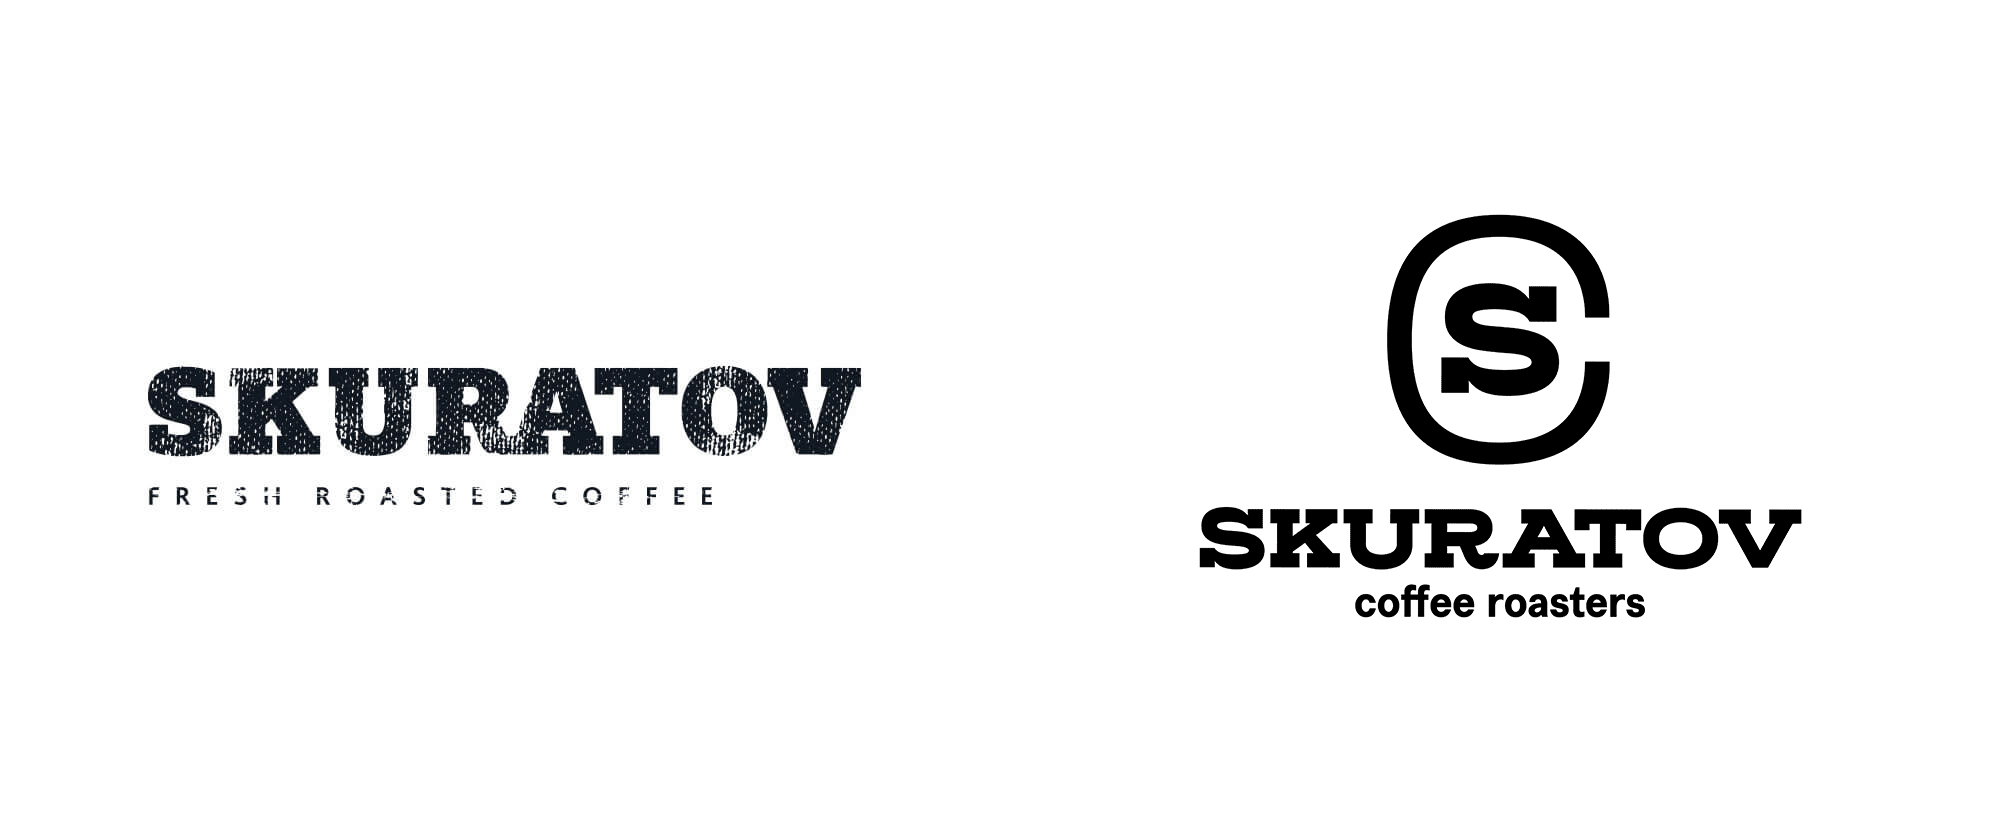 New Logo and Identity for Skuratov Coffee by White Russian Studio